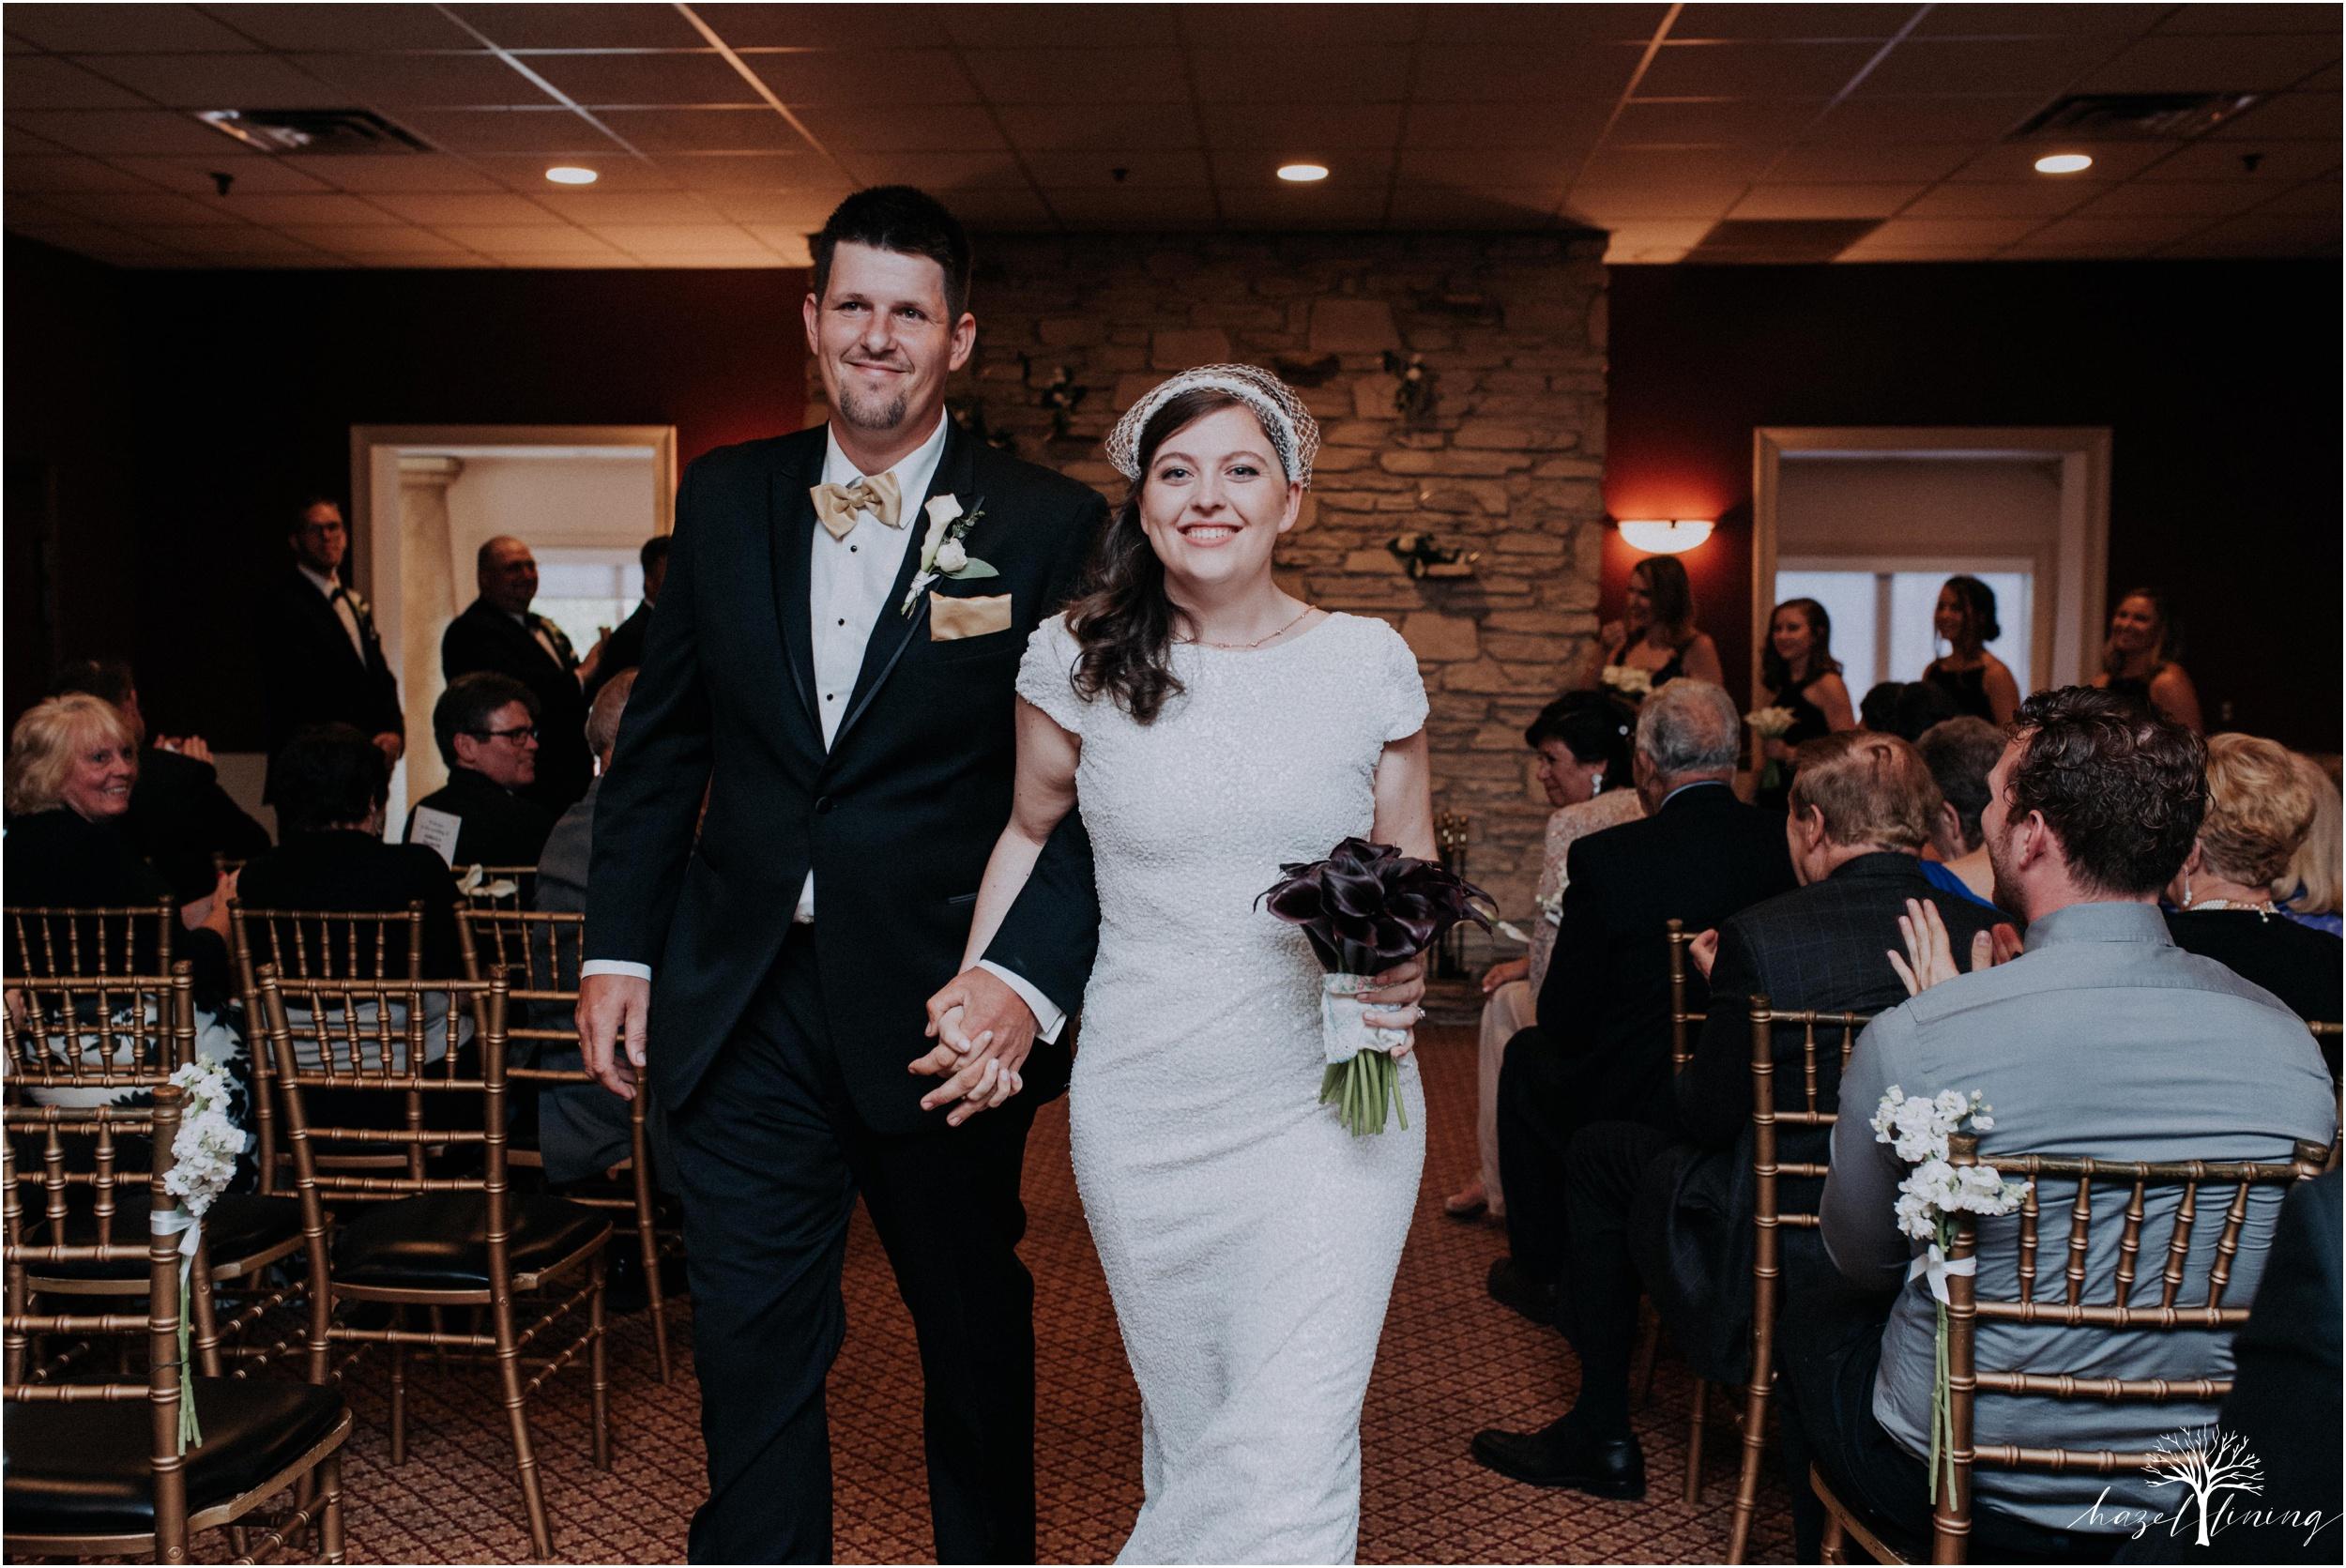 elizabeth-doelp-andrew-foreback-middletown-country-club-summer-langhorne-pennsylvania-wedding-hazel-lining-travel-wedding-elopement-photography_0118.jpg